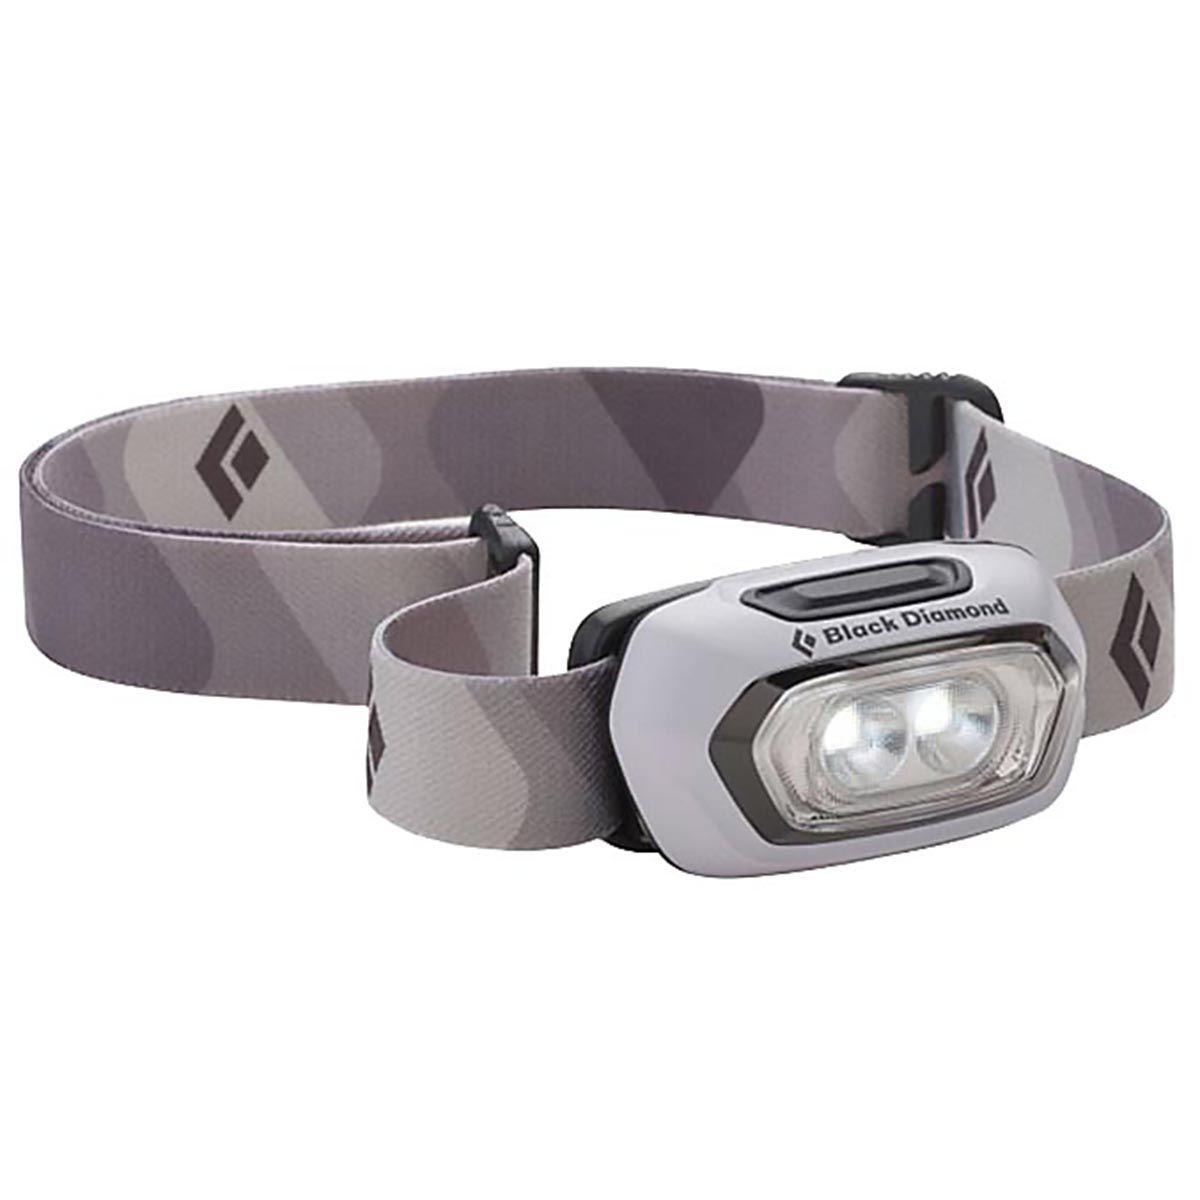 Lanterna de Cabeça Gizmo 60 Lumens IPX4 - Black Diamond